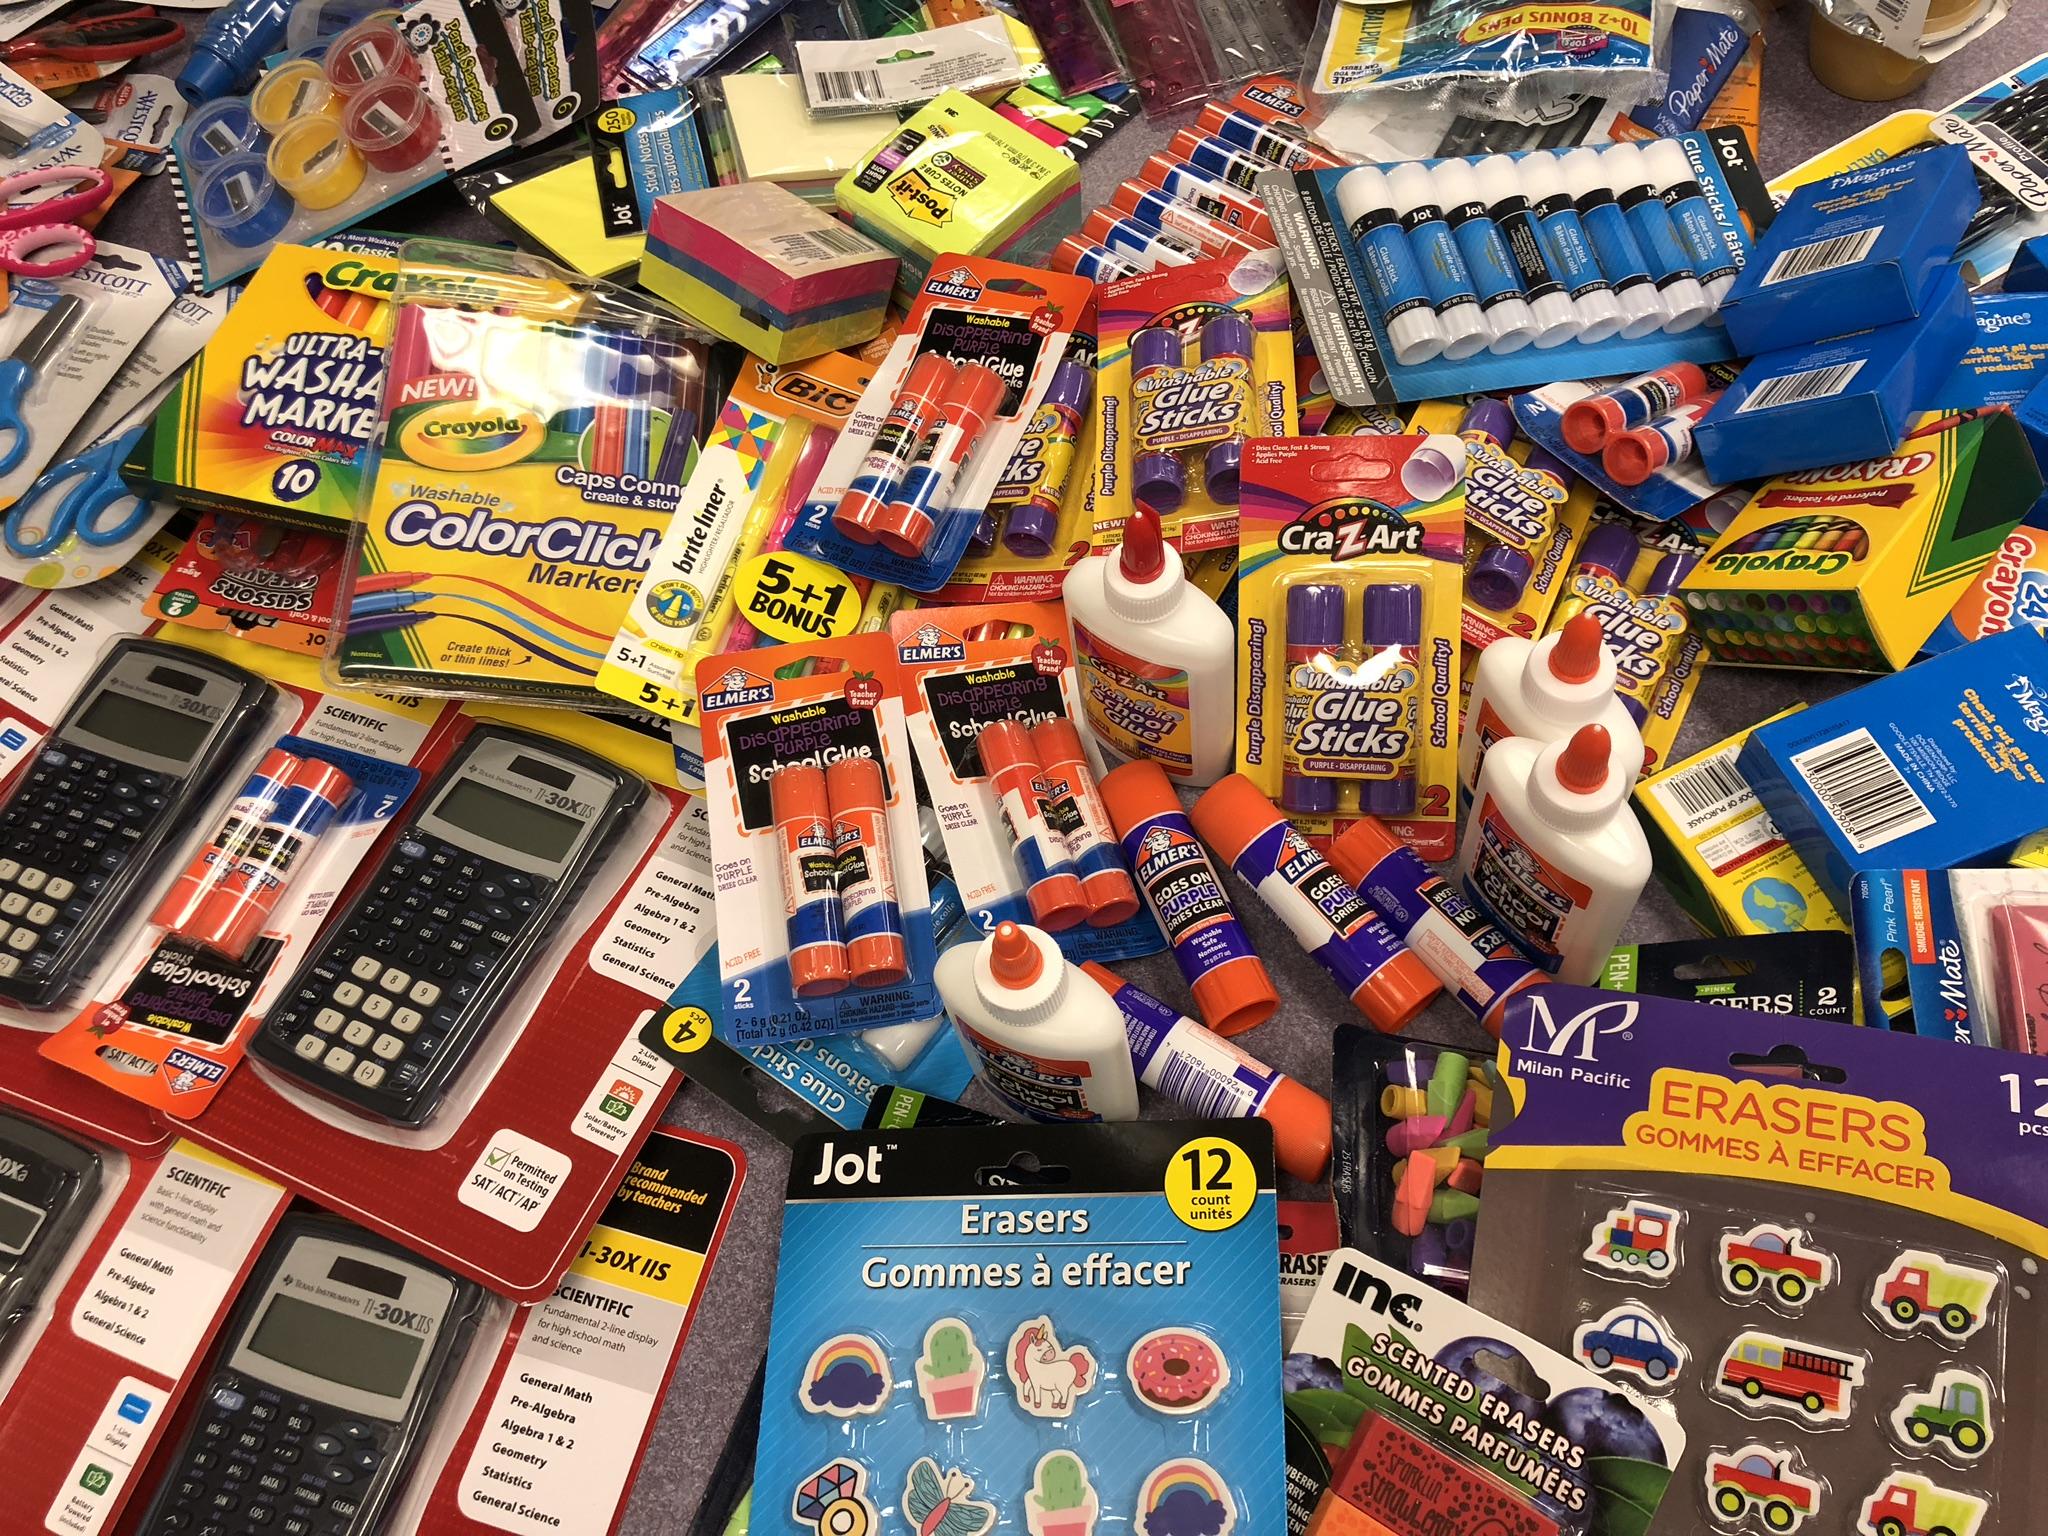 DNP Employees Collect School Supplies - DNP Ribbons